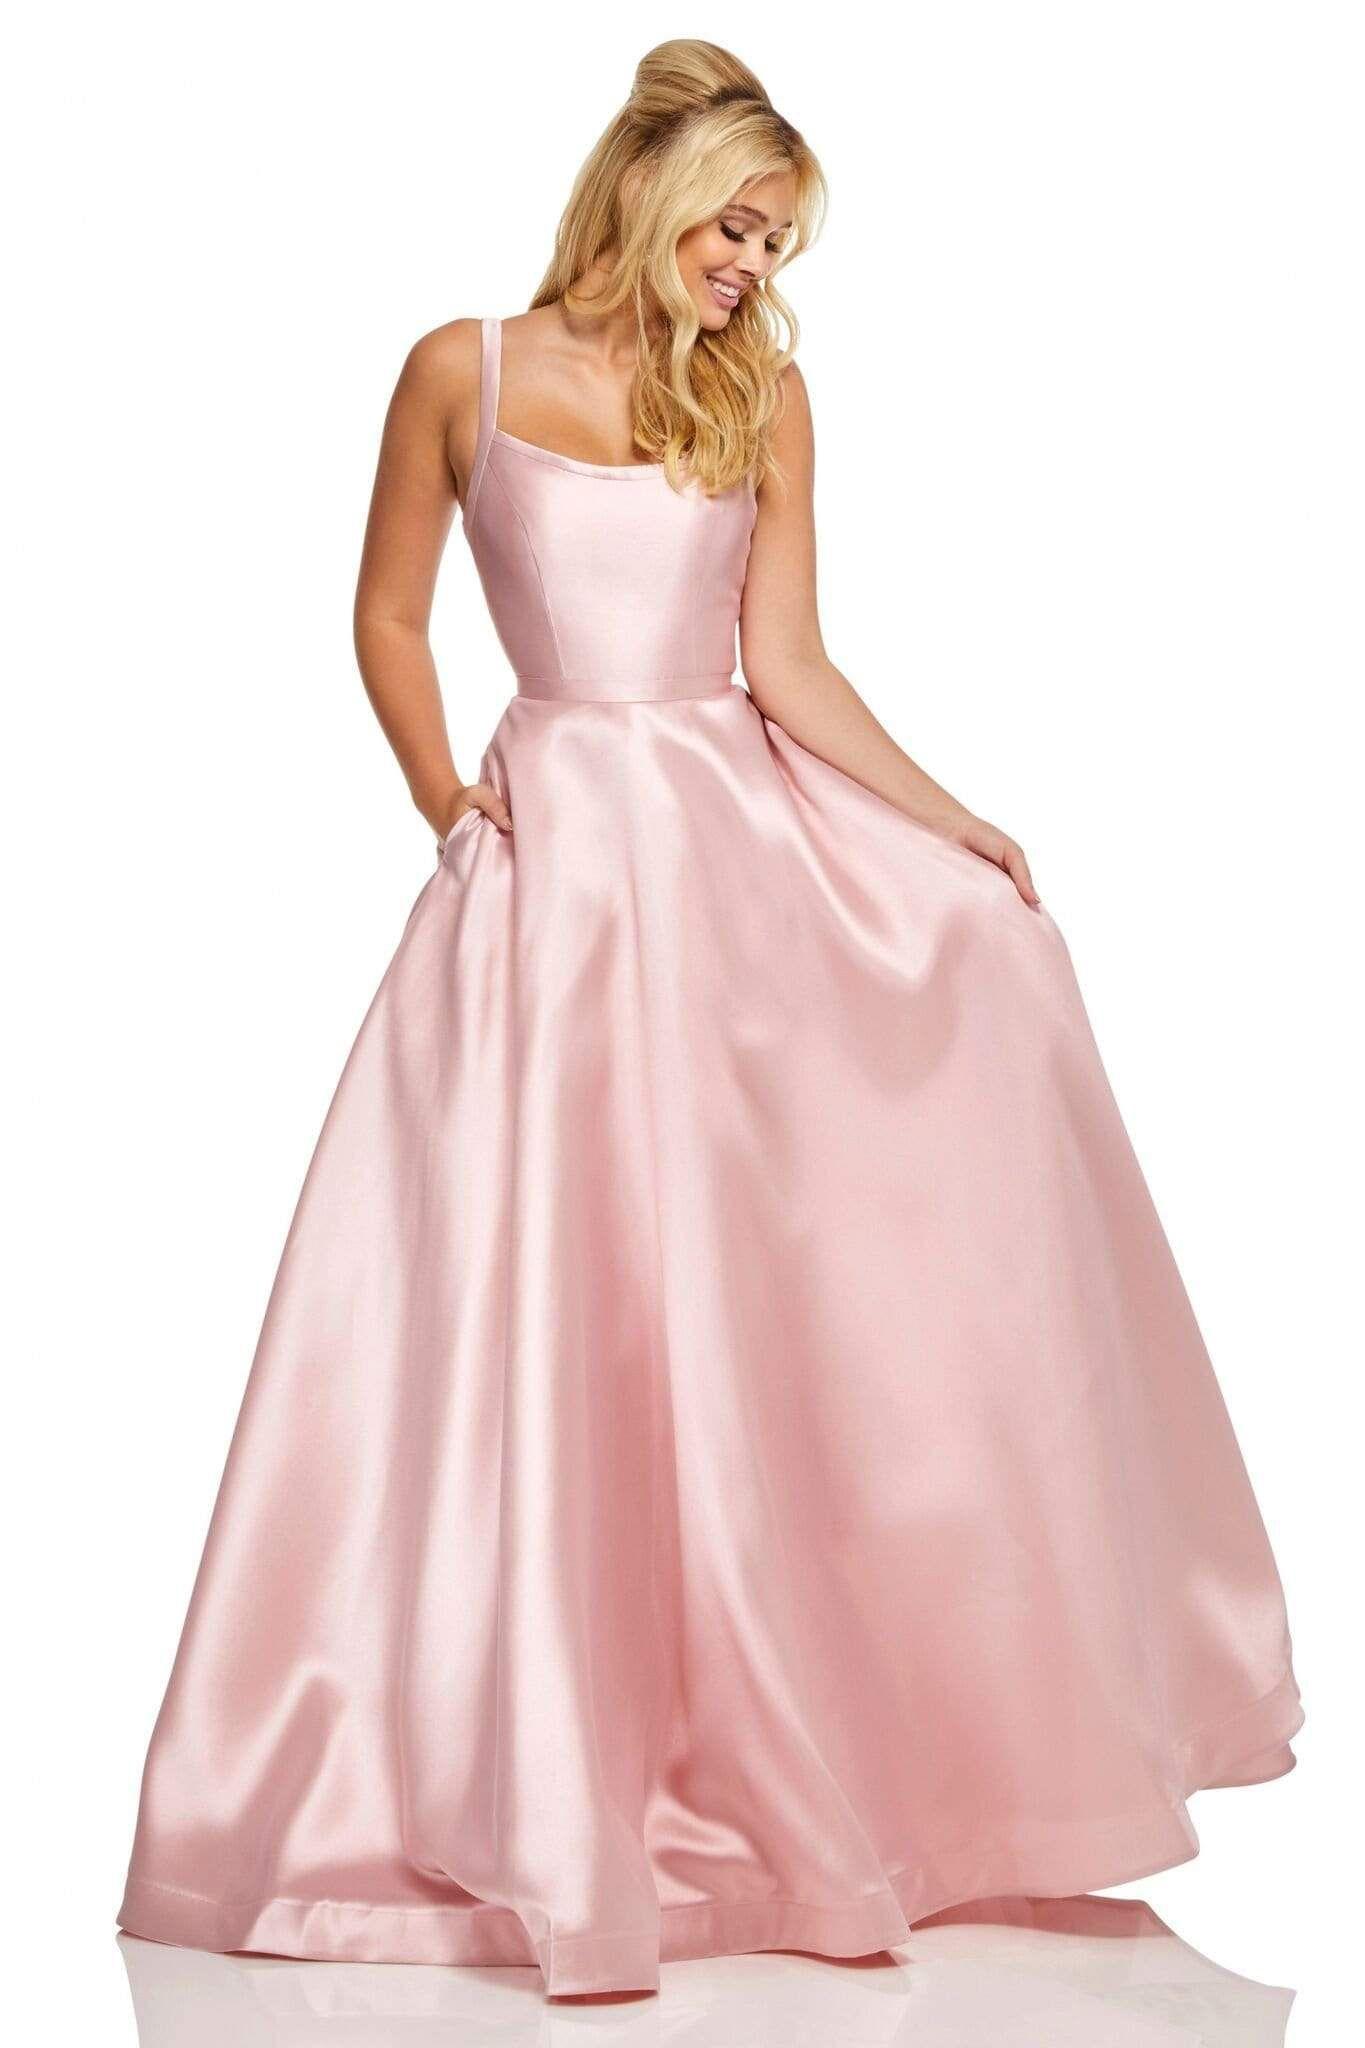 Sherri Hill 52715 Scoop Neck Strappy Back Long A Line Satin Dress In 2021 Sherri Hill Prom Dresses Long Prom Dresses With Pockets A Line Prom Dresses [ 2048 x 1365 Pixel ]